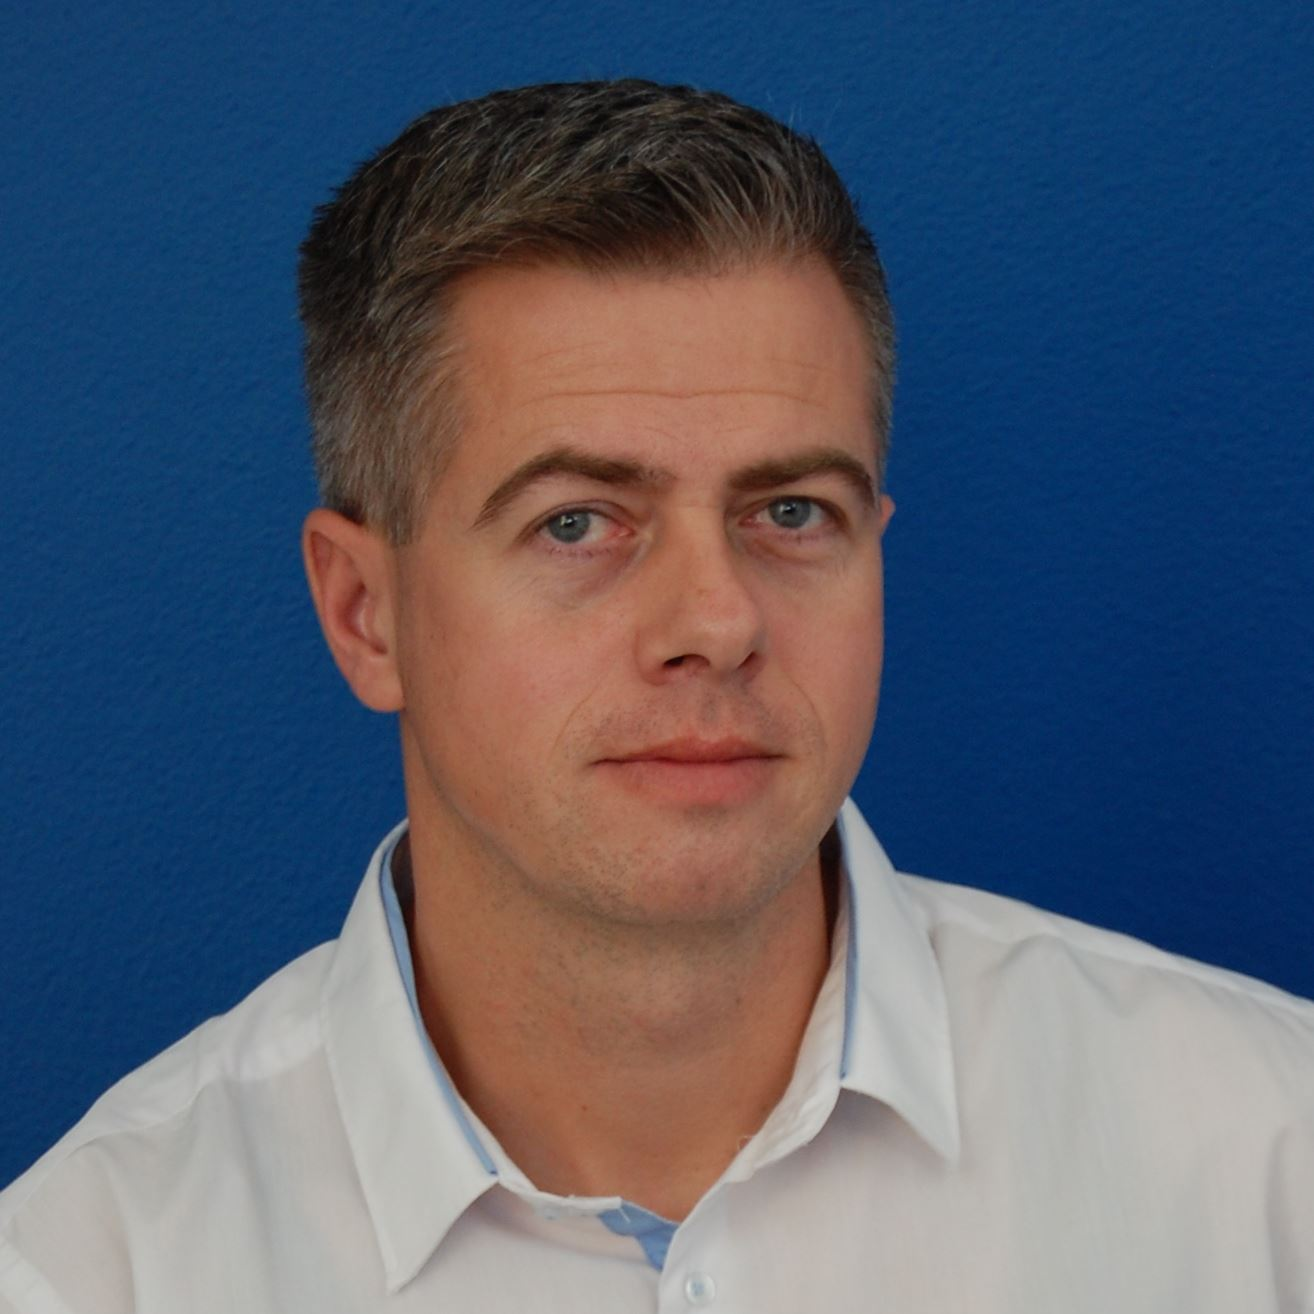 Michal Brož